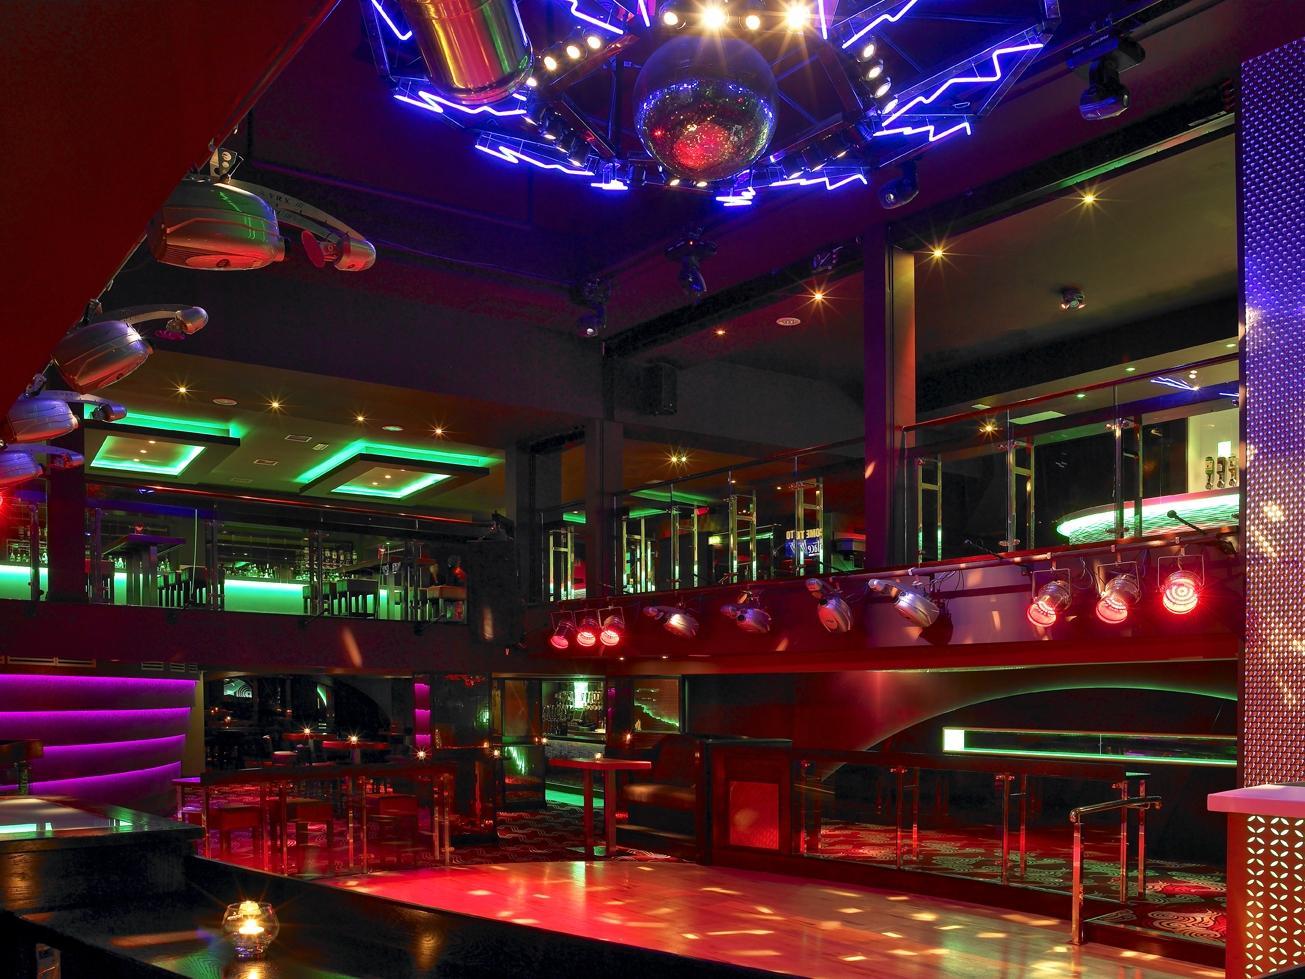 palace-nightclub-venue-offaly